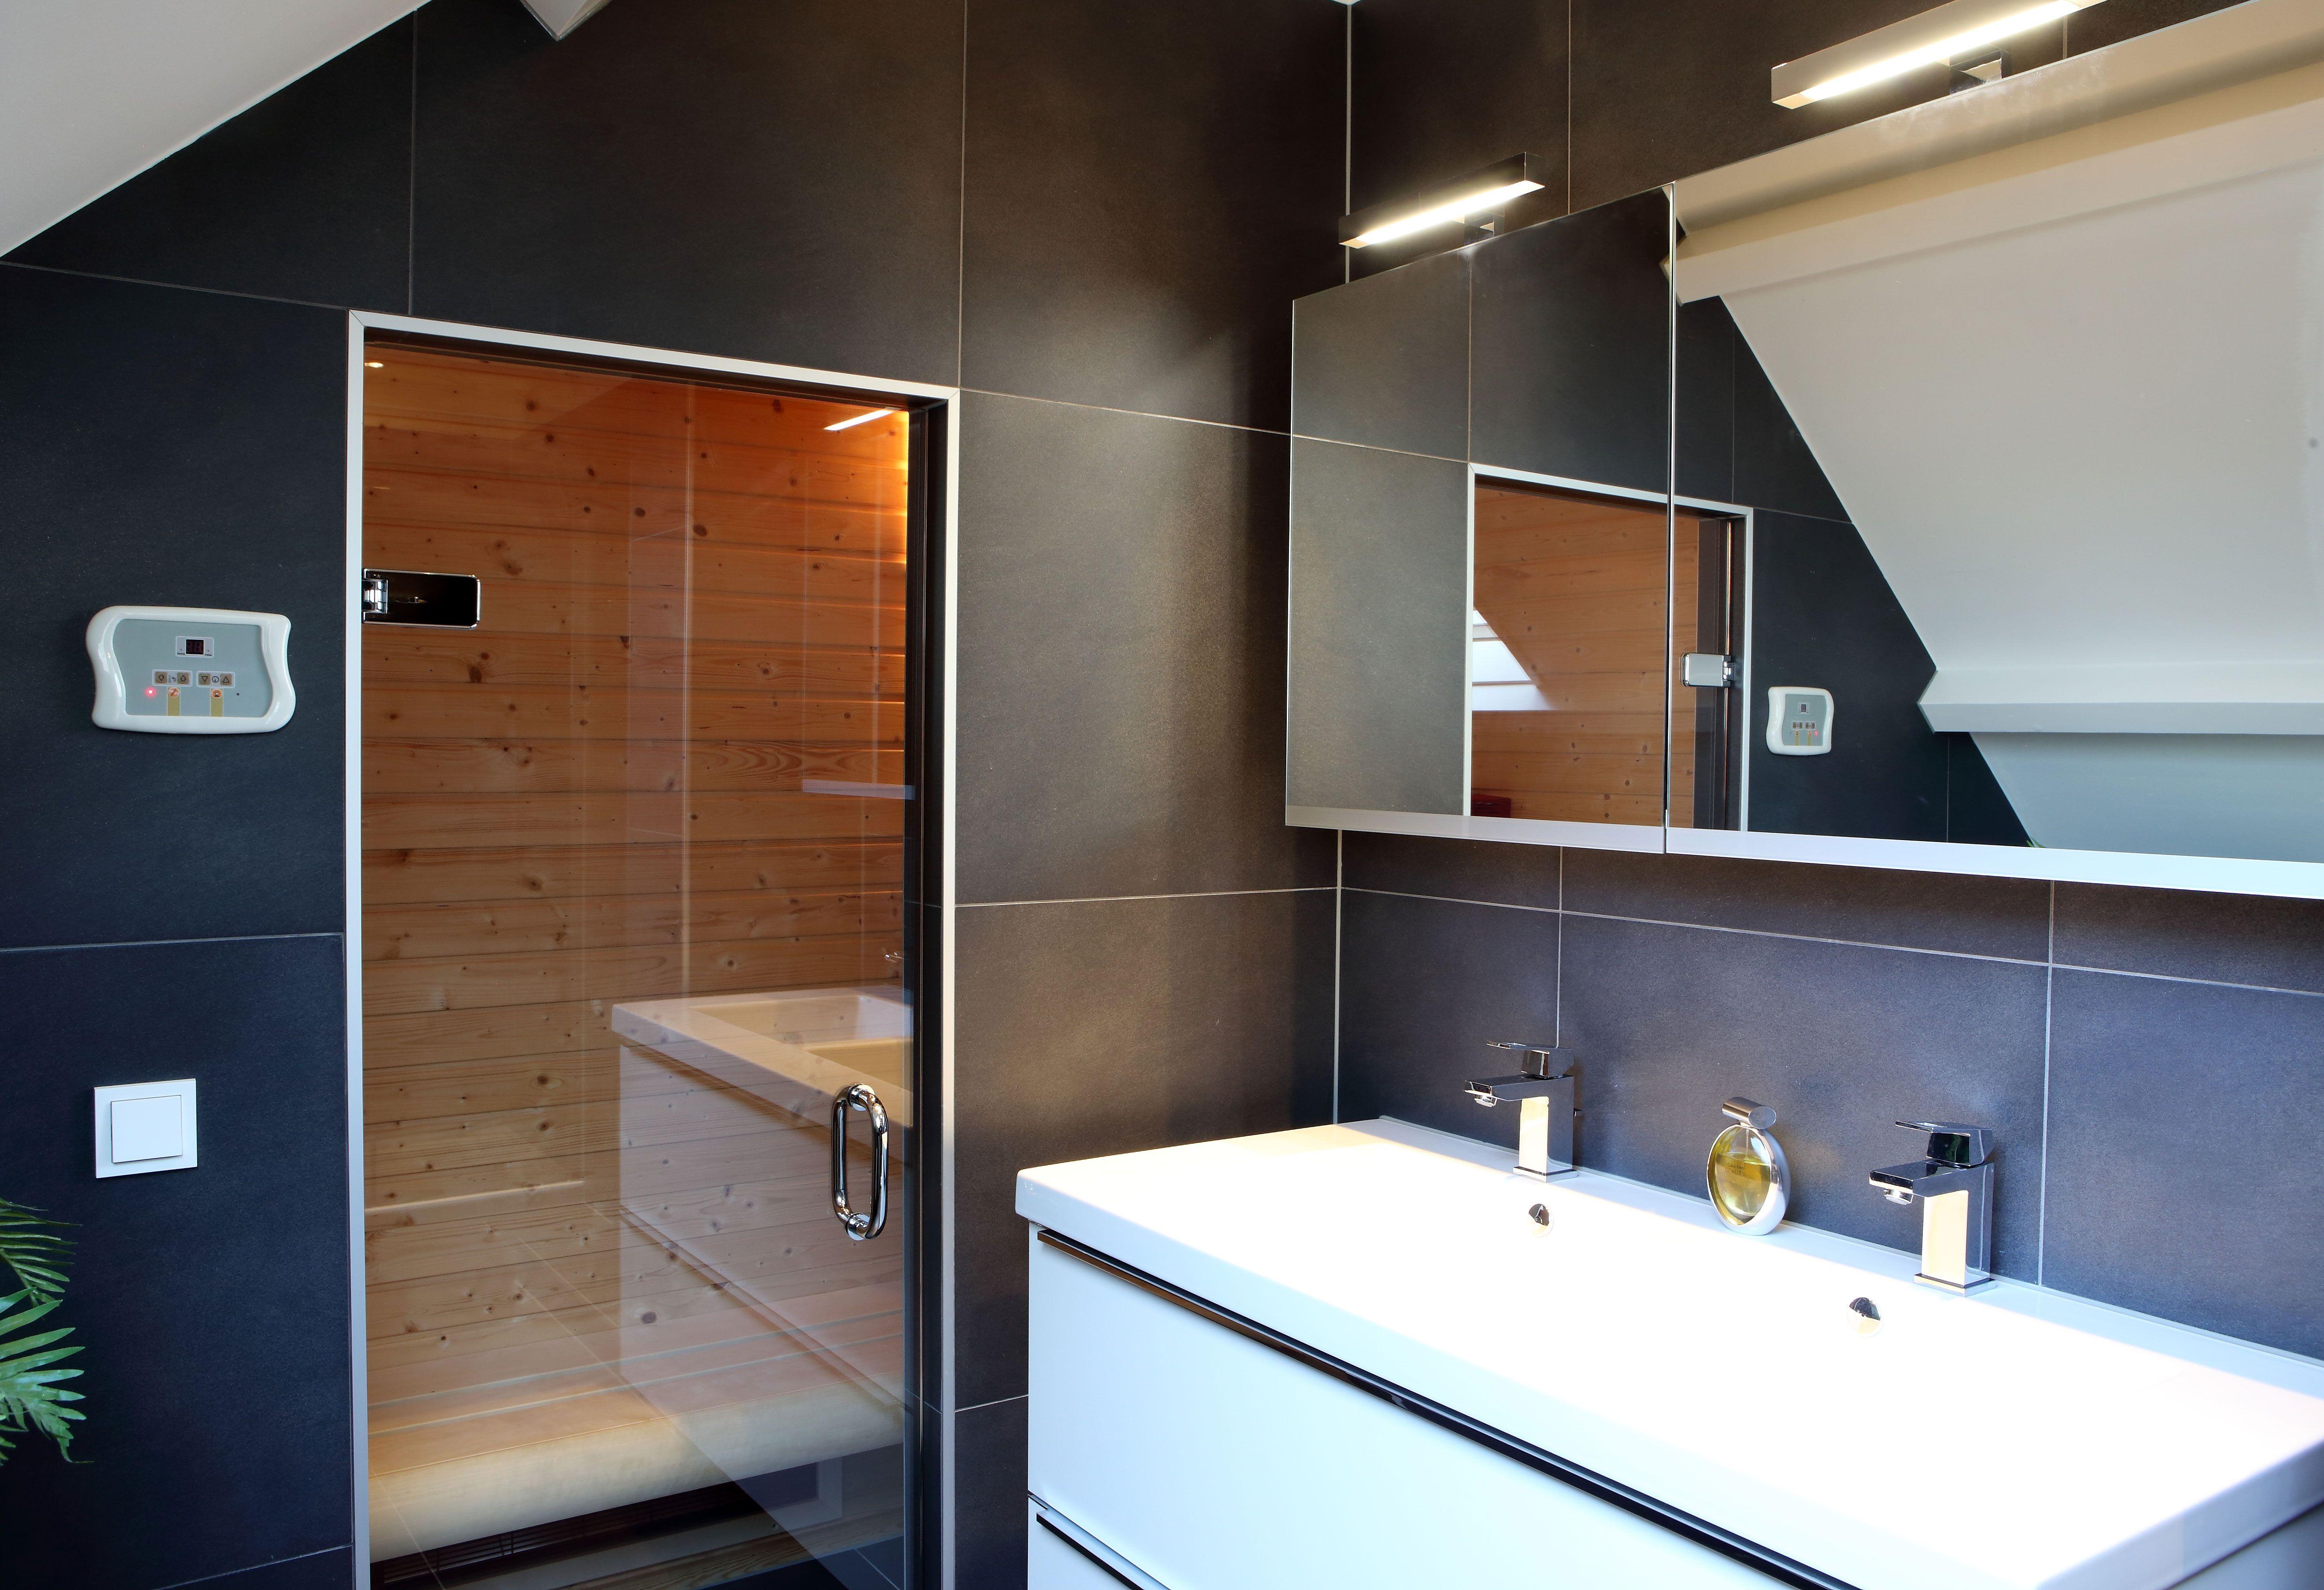 Beautiful Badkamer Scheemda Ideas - New Home Design 2018 - ummoa.us